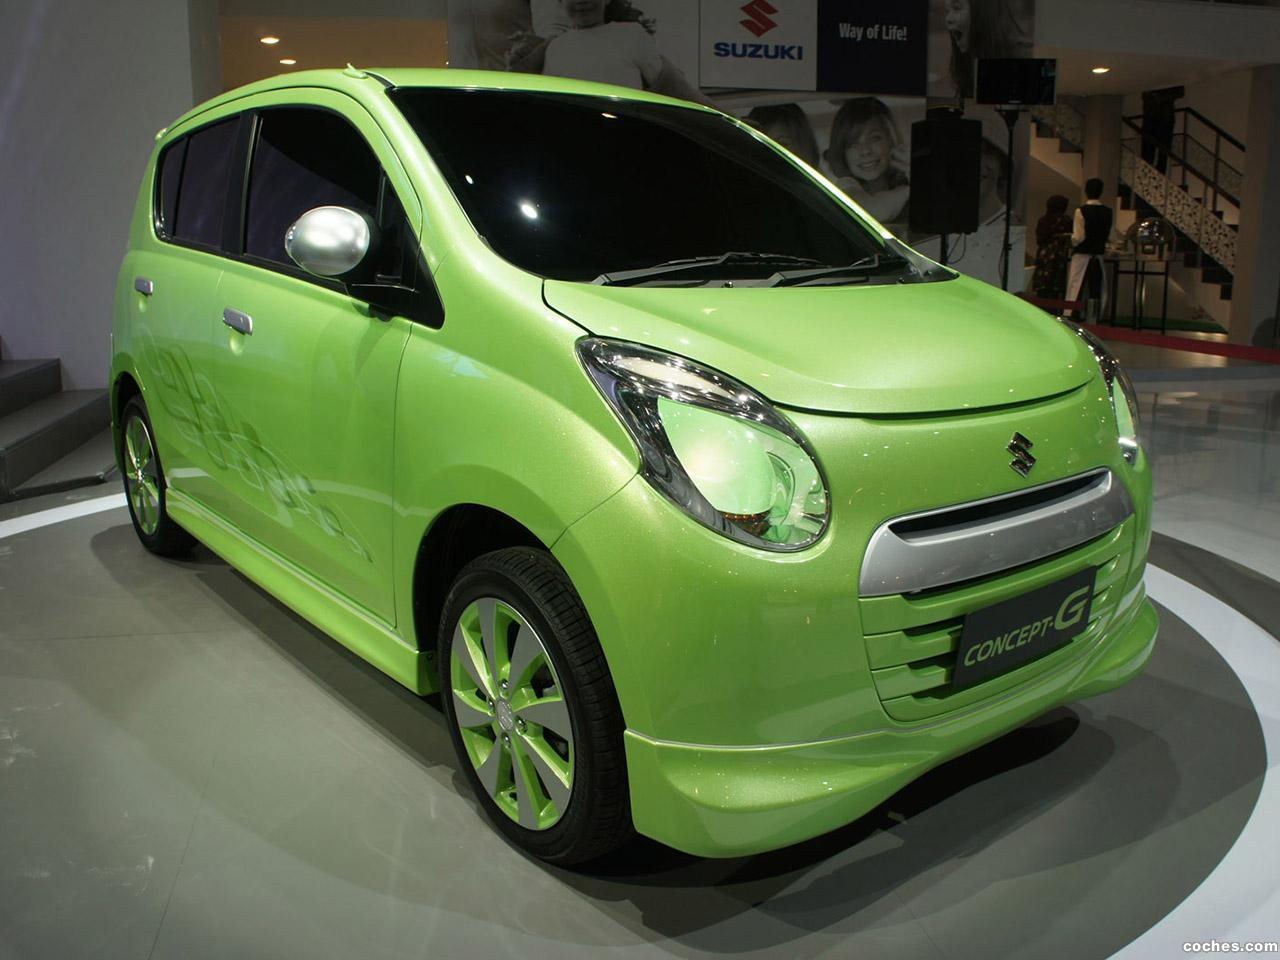 Foto 0 de Suzuki Concept G 2011